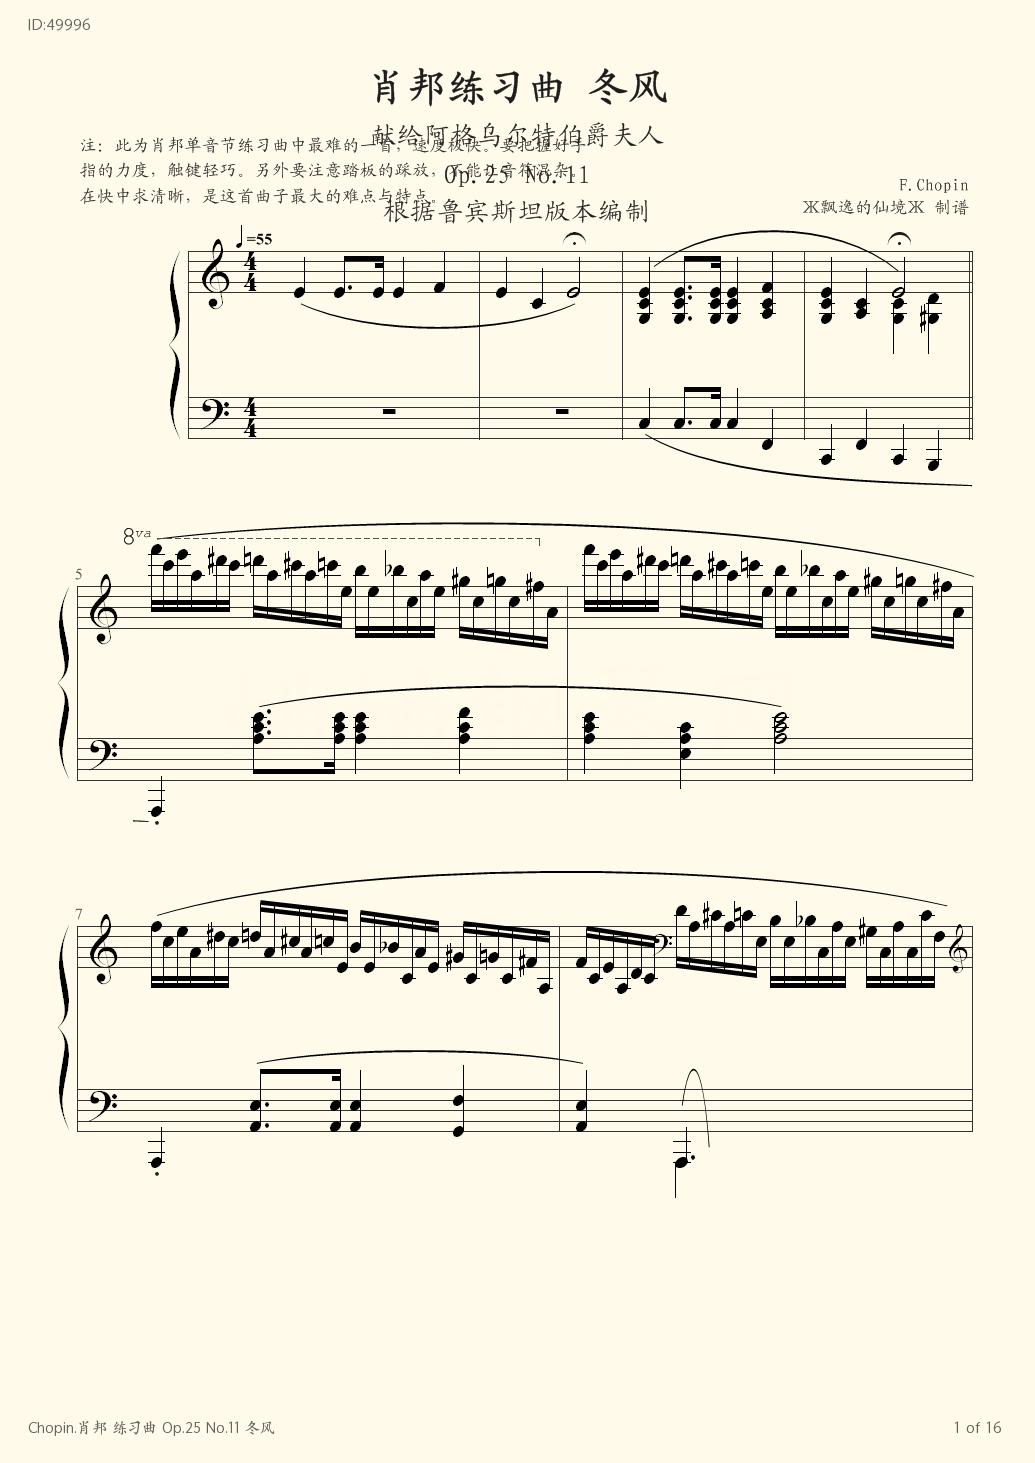 Chopin Op 25 No 11  - Chopin  - first page